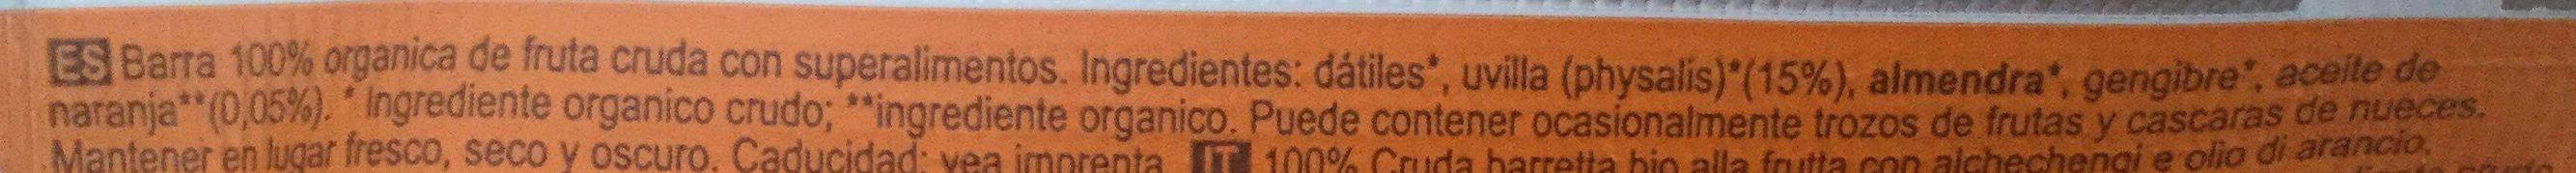 Inca berry - Ingredientes